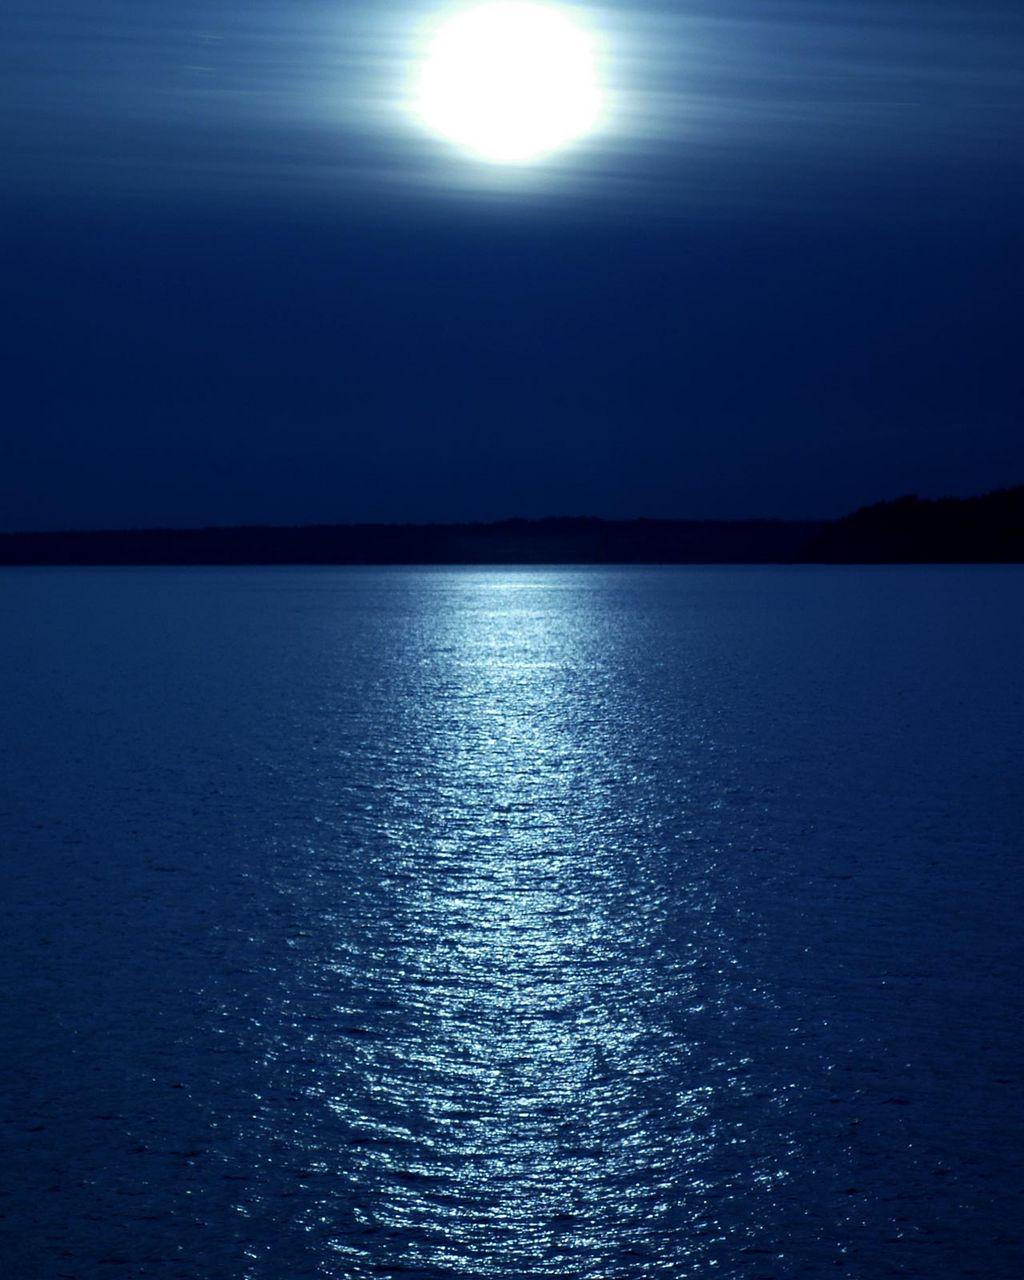 http://images.nikonians.org/galleries/data/3821/22586ocean_blue.jpg